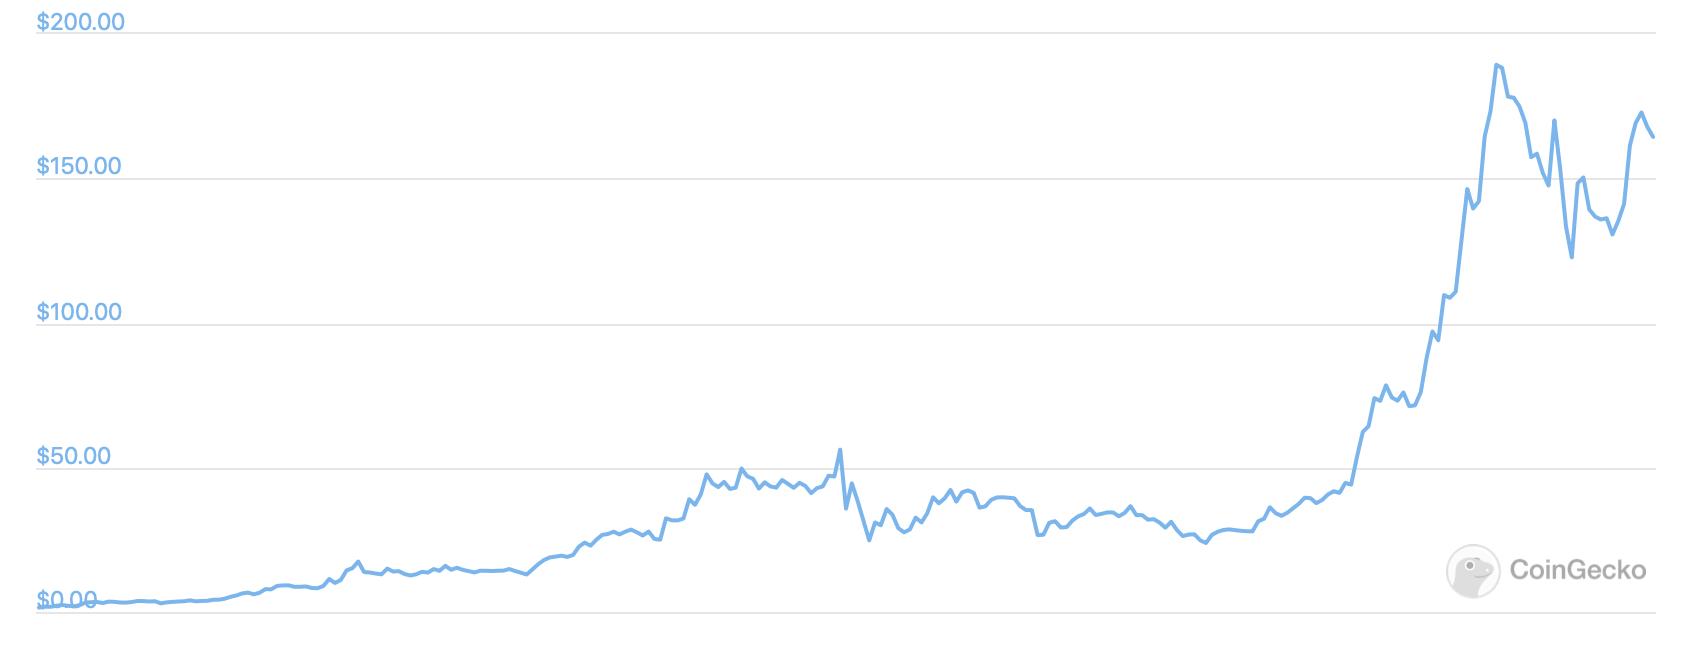 криптовалюты график курс